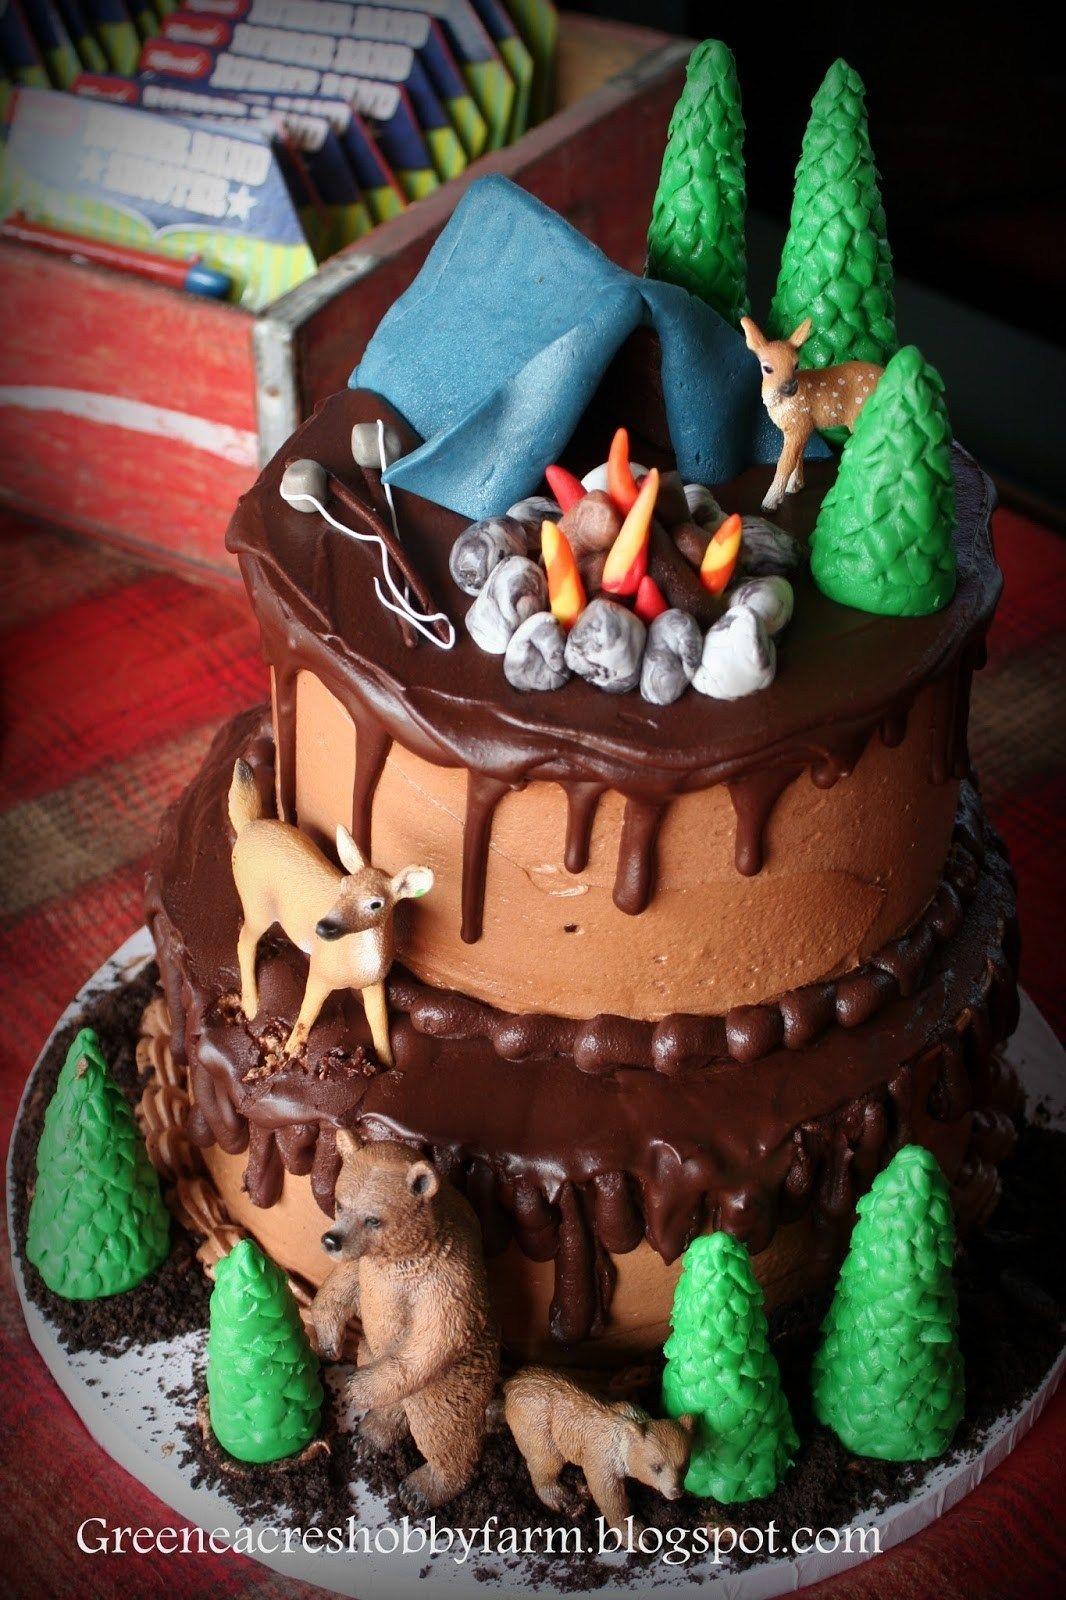 Astounding 25 Creative Photo Of Camping Birthday Cake Countrydirectory Birthday Cards Printable Opercafe Filternl